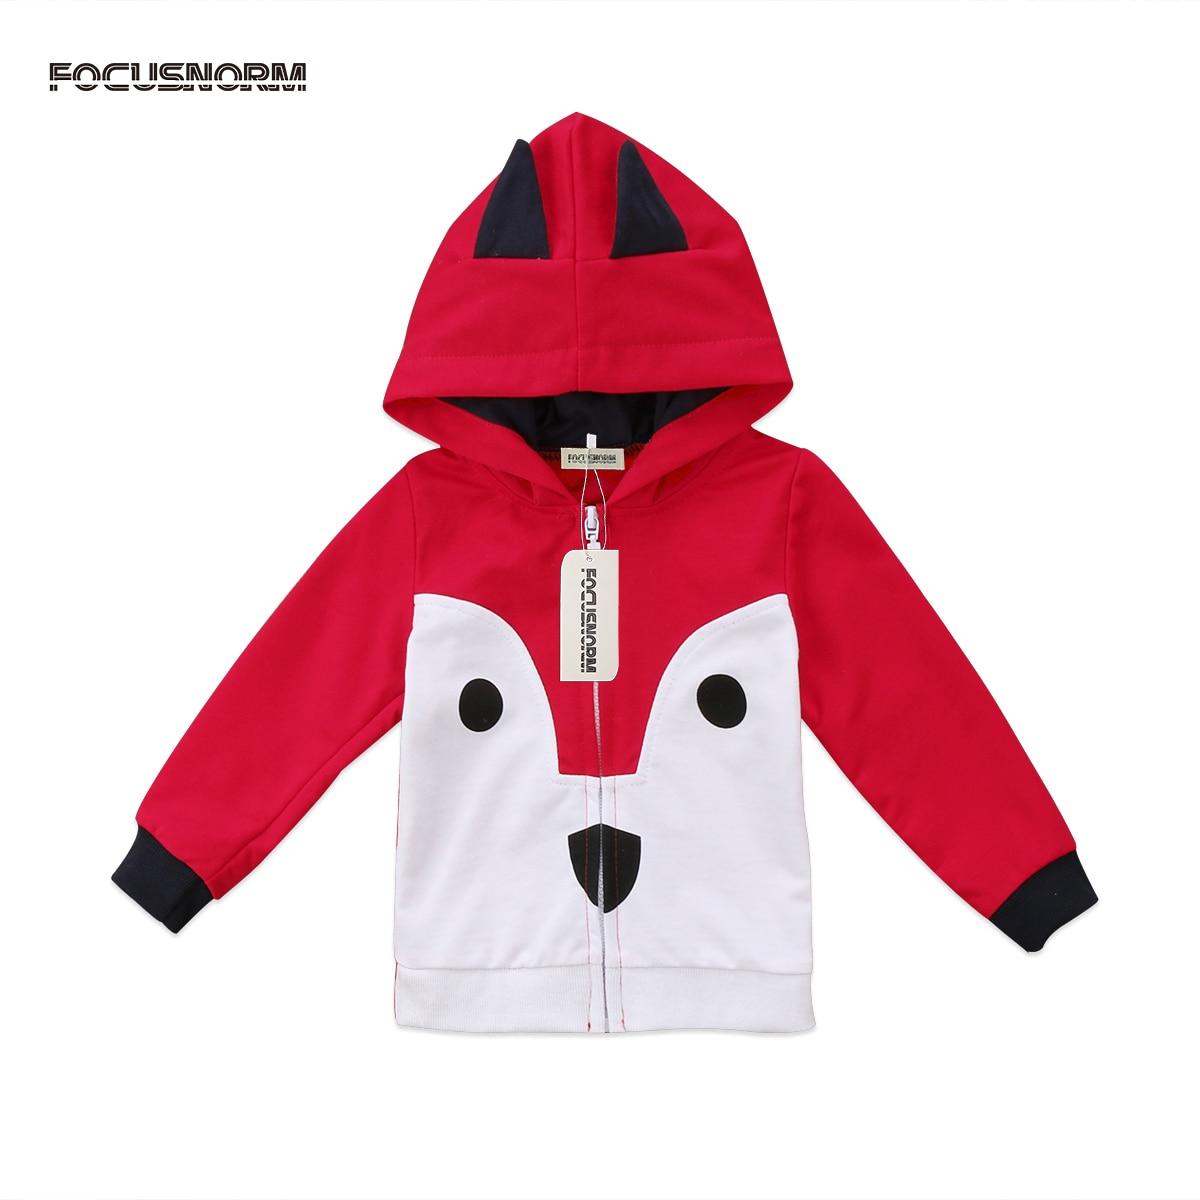 Fashion Kids Baby Boys Girls Infant Clothes Zipper Cartoon Animals Long Sleeves Sweatshirts Hoodies Tops